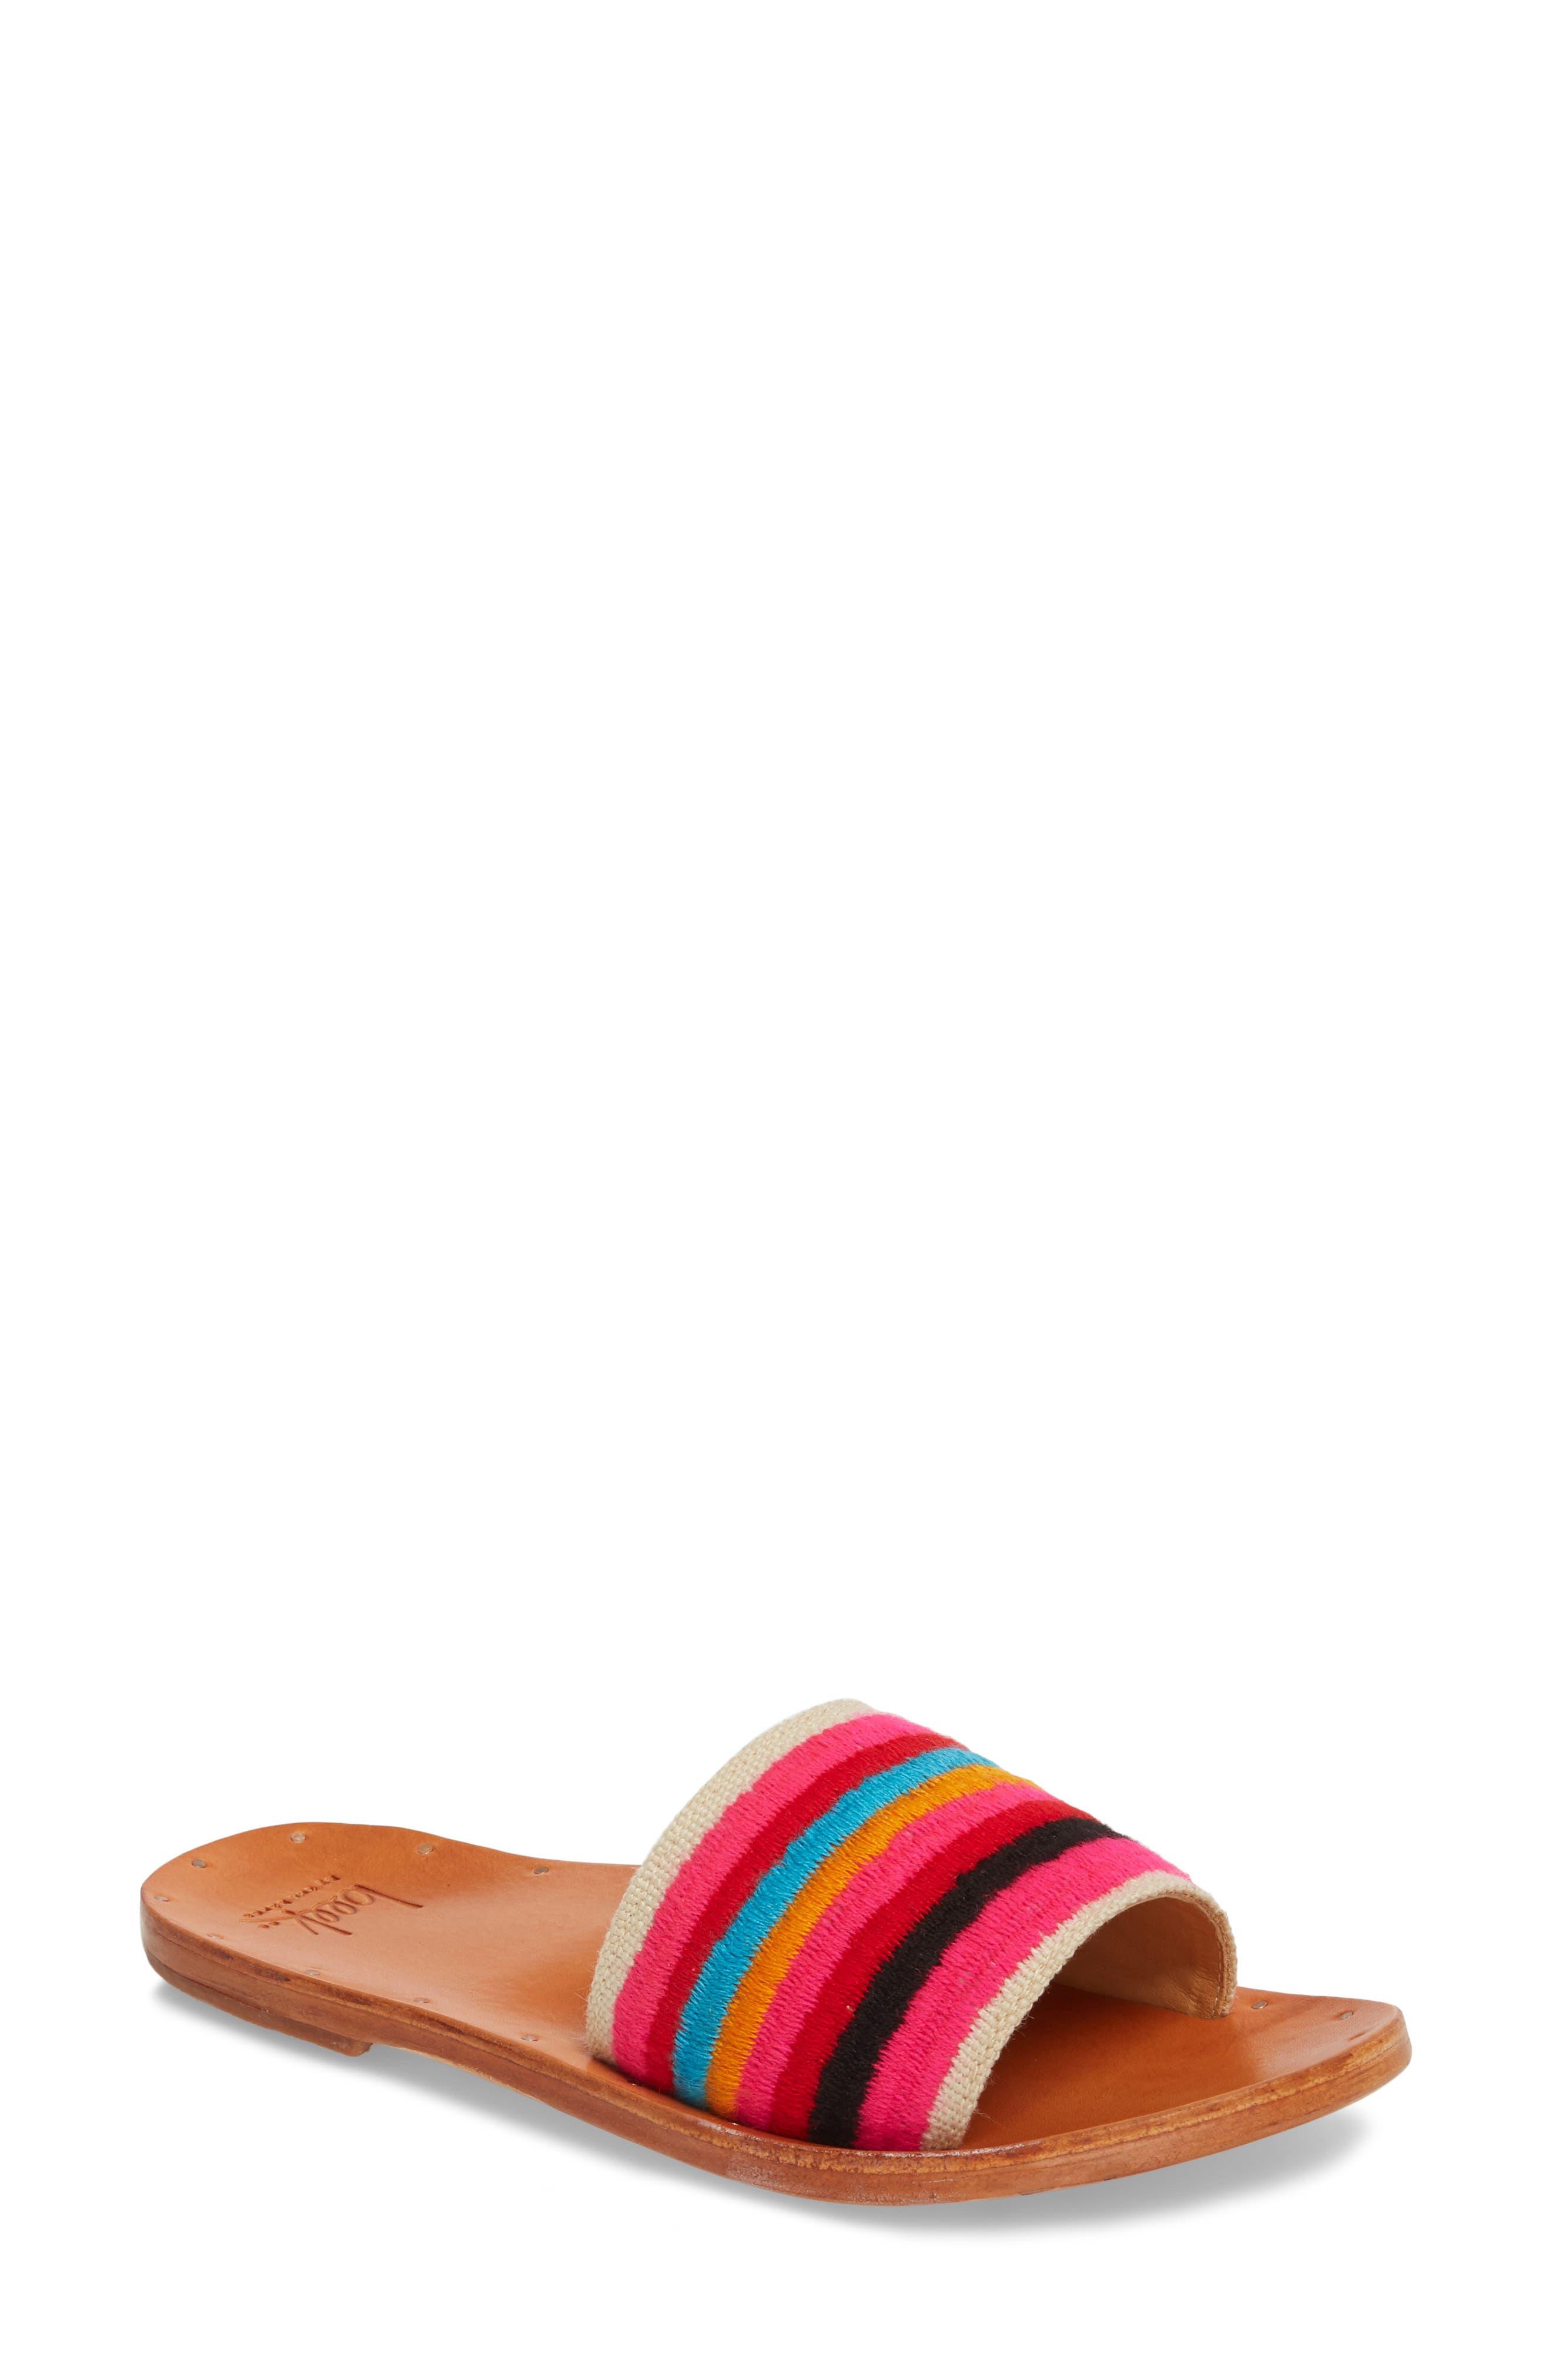 Lovebird Embroidered Slide Sandal,                         Main,                         color, Multi/ Tan